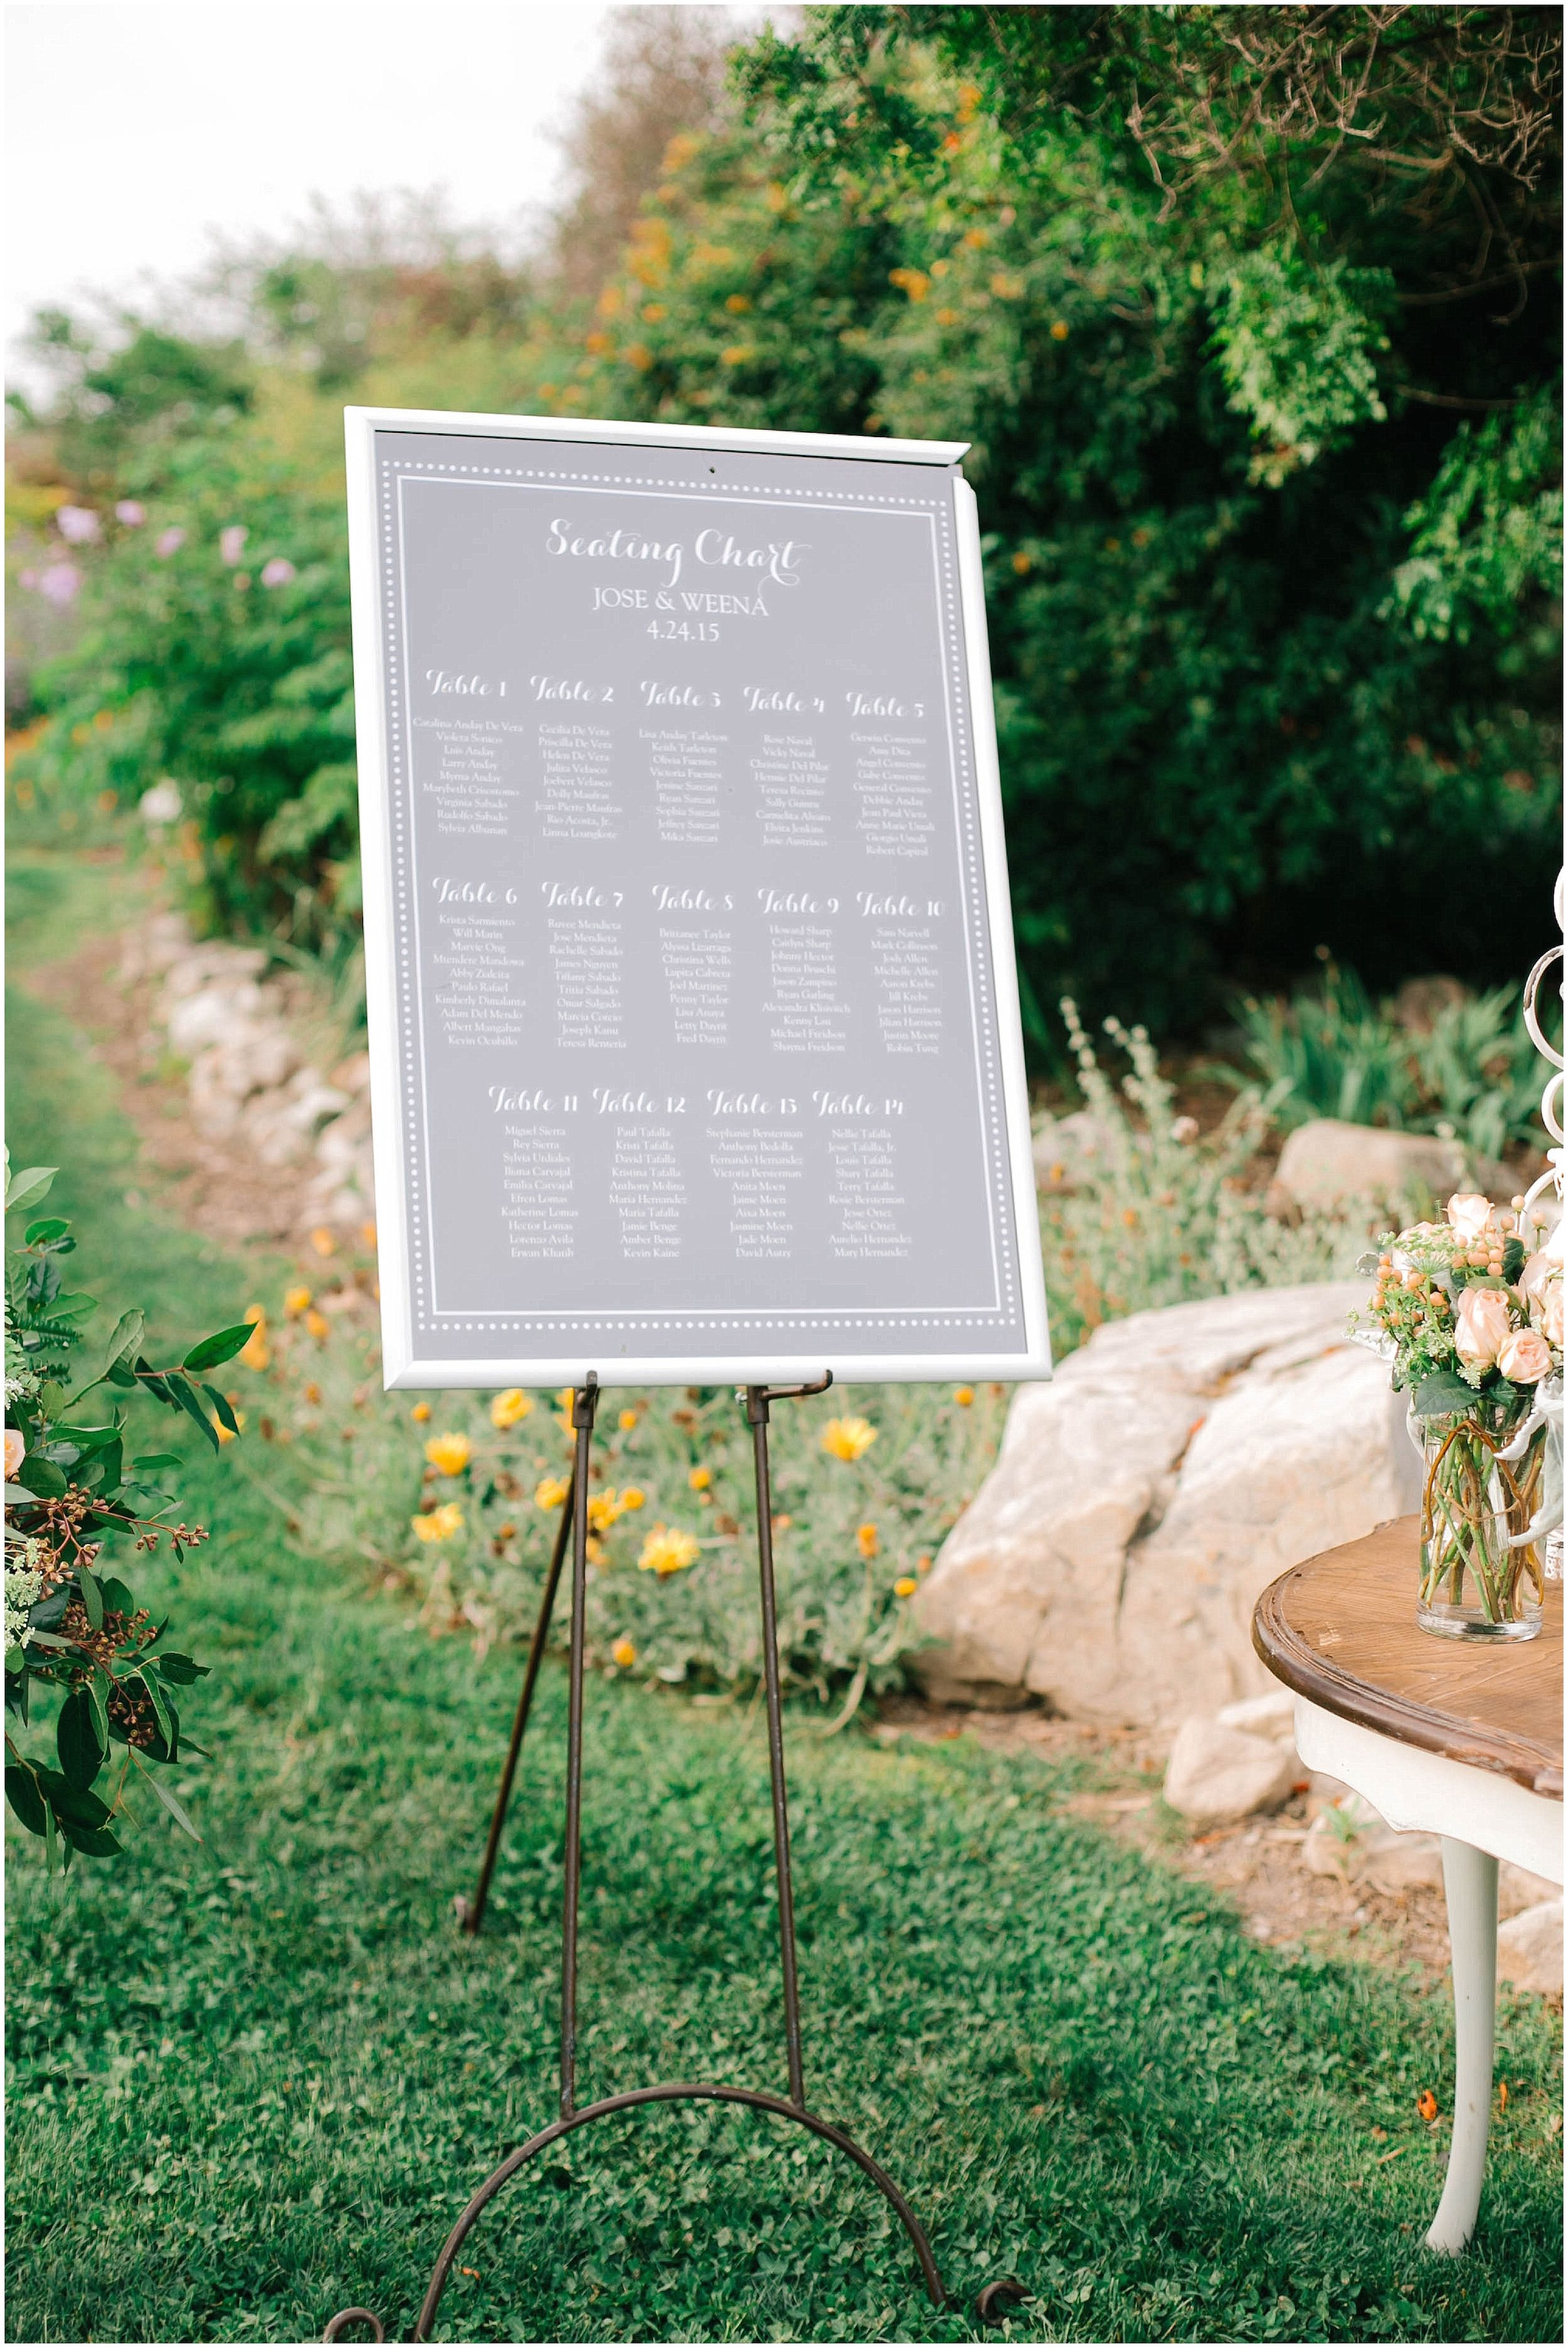 South Coast Botanic Garden Wedding by South coast